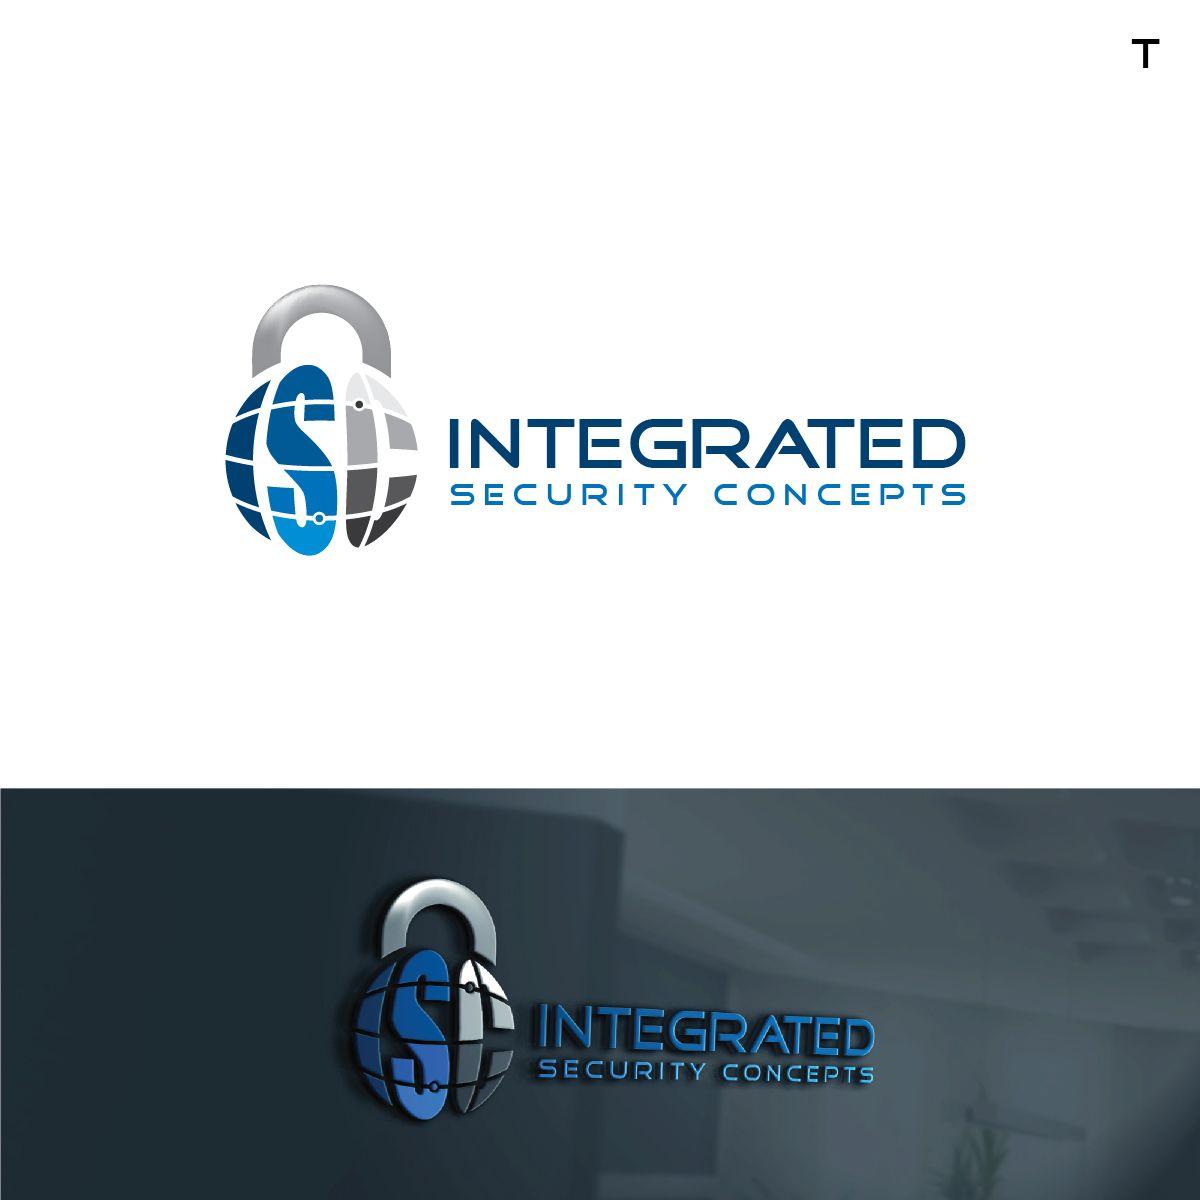 Freelance Logo Design Web Design Graphic Design Designcrowd In 2020 Logo Design Web Design Logos